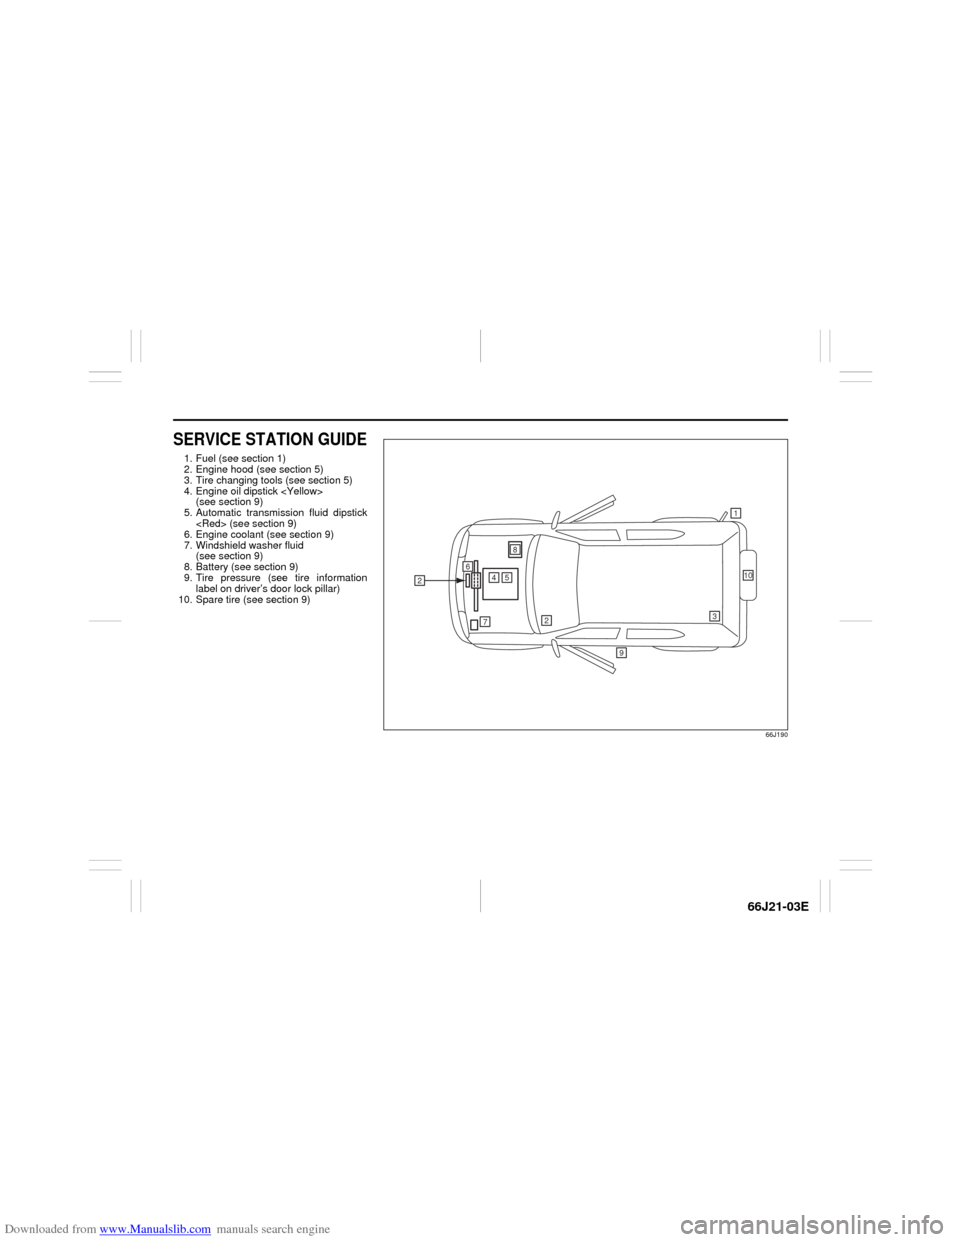 hight resolution of 2008 suzuki xl7 repair manual free download